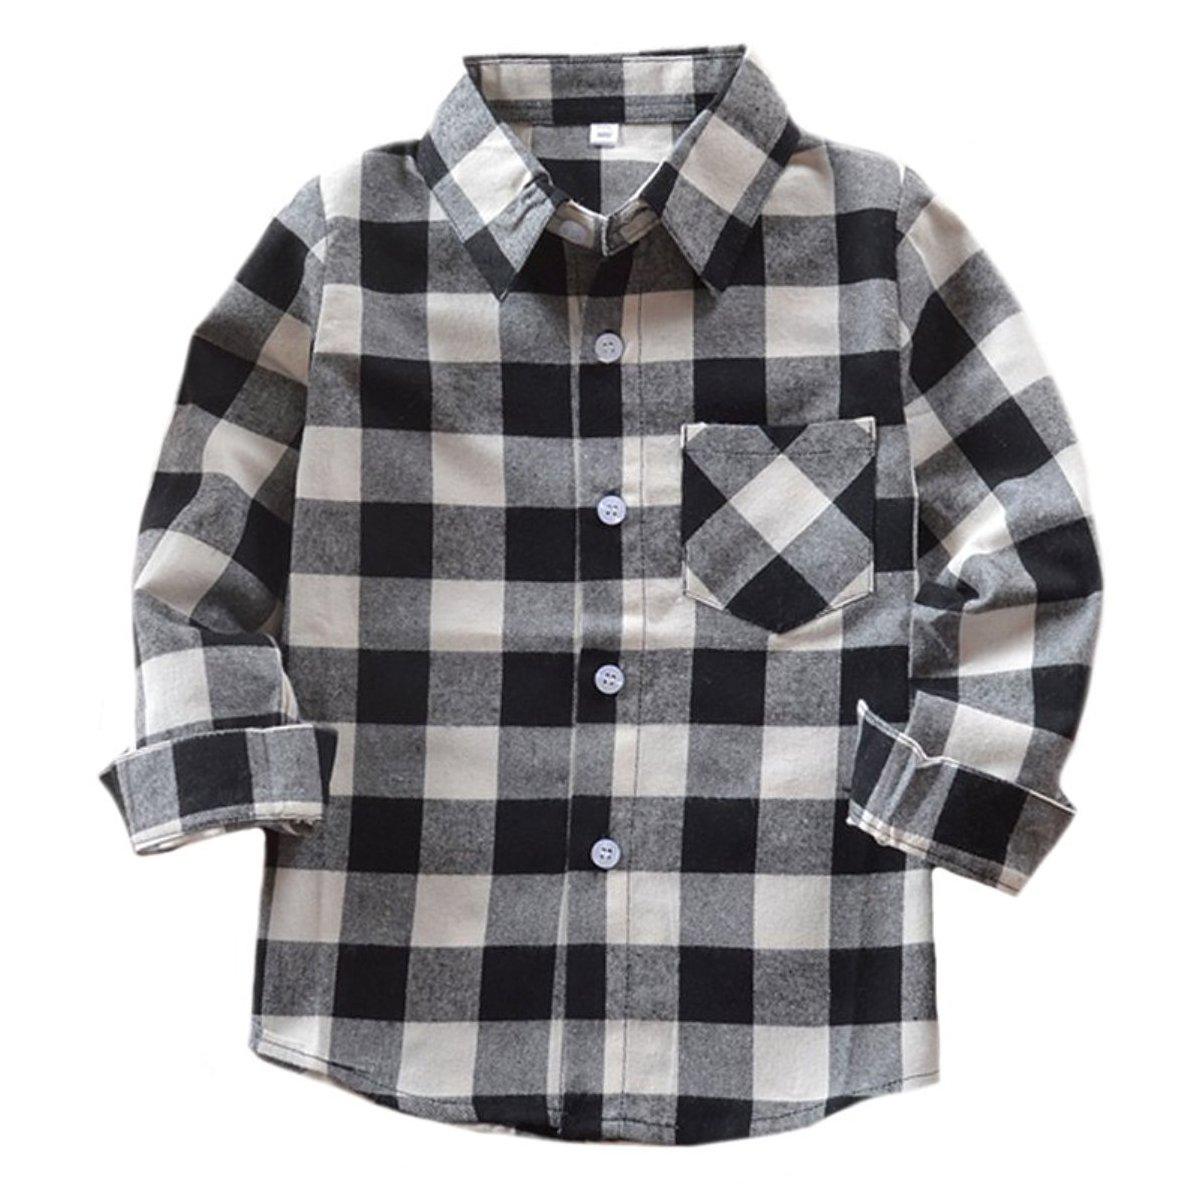 Benibos Boys Girls Flannel Button Down Check Plaid Shirts 4-5T) E004-120